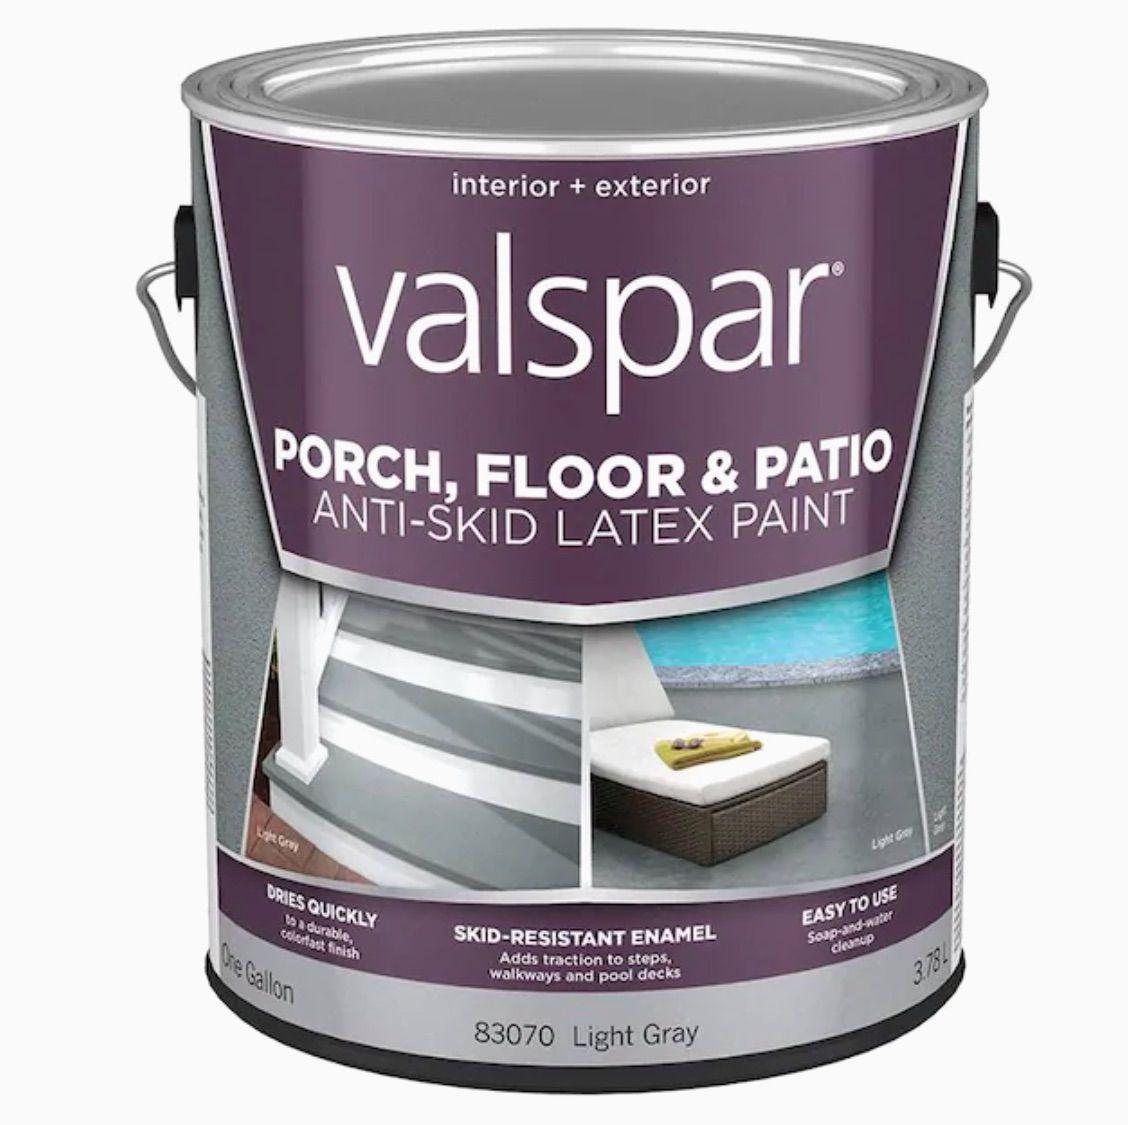 Valspar Porch Floor and Patio